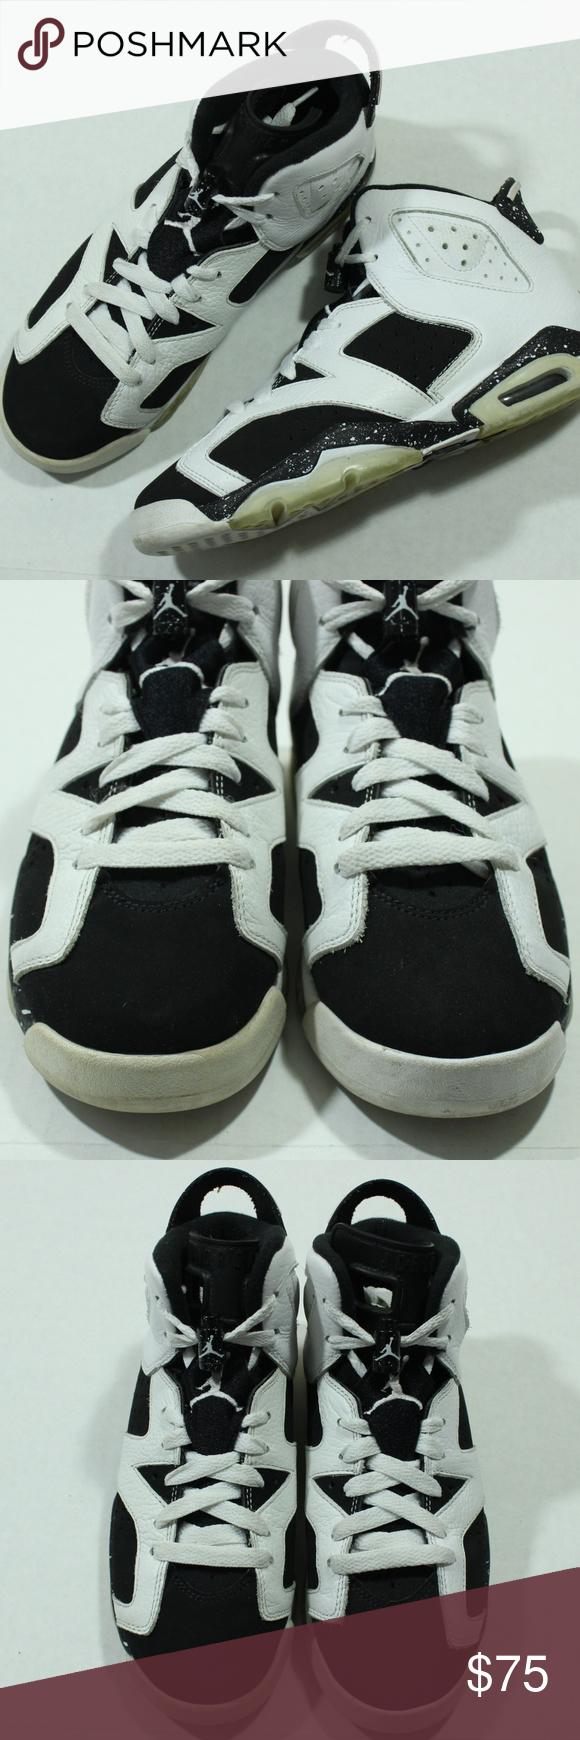 super popular aa7f4 31bf4 Nike Air Jordan 6 Retro High Tops Oreo Black White Nike Air Jordan 6 Retro  High